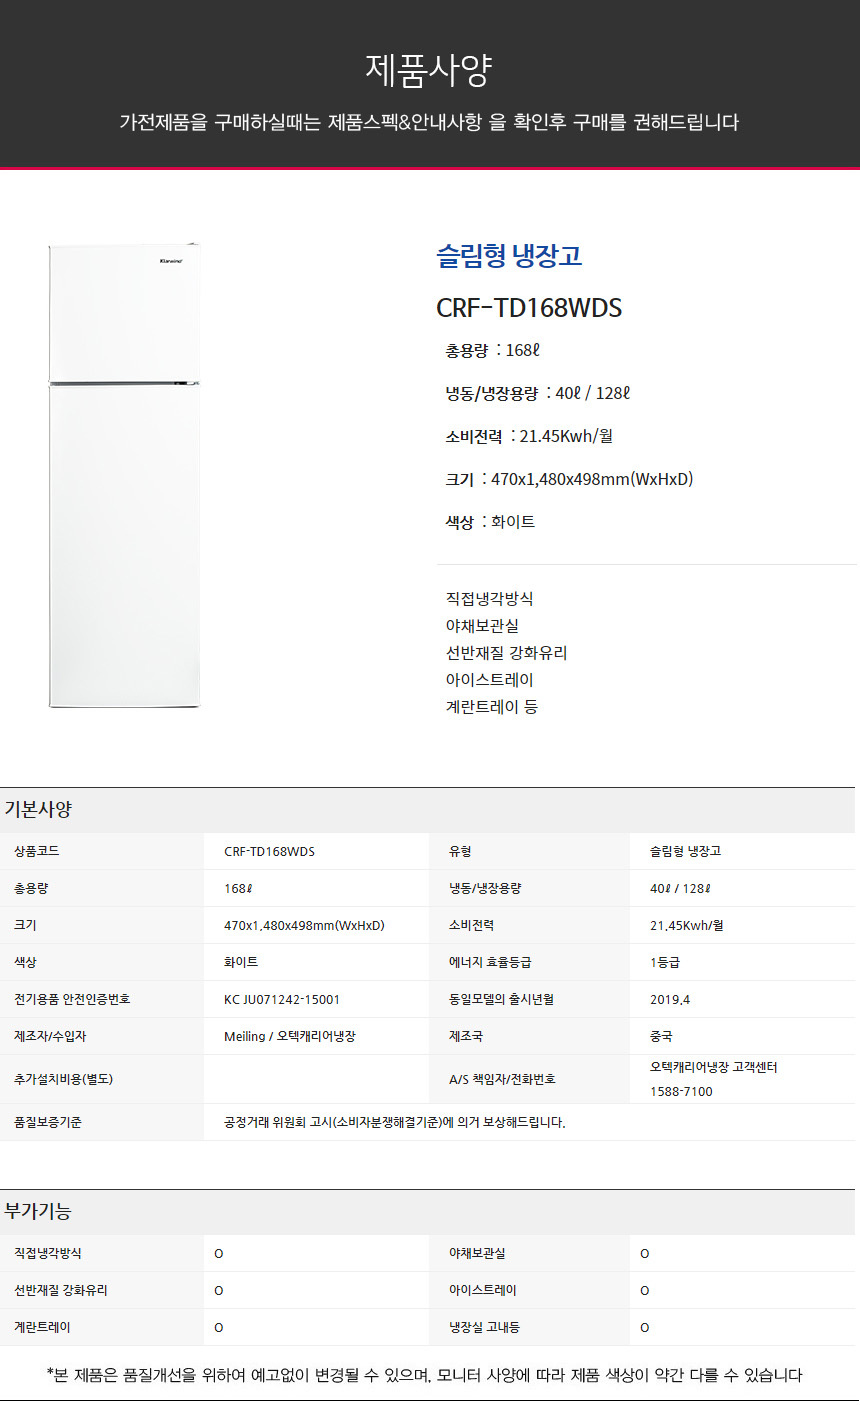 CRF-TD168WDS_D.jpg